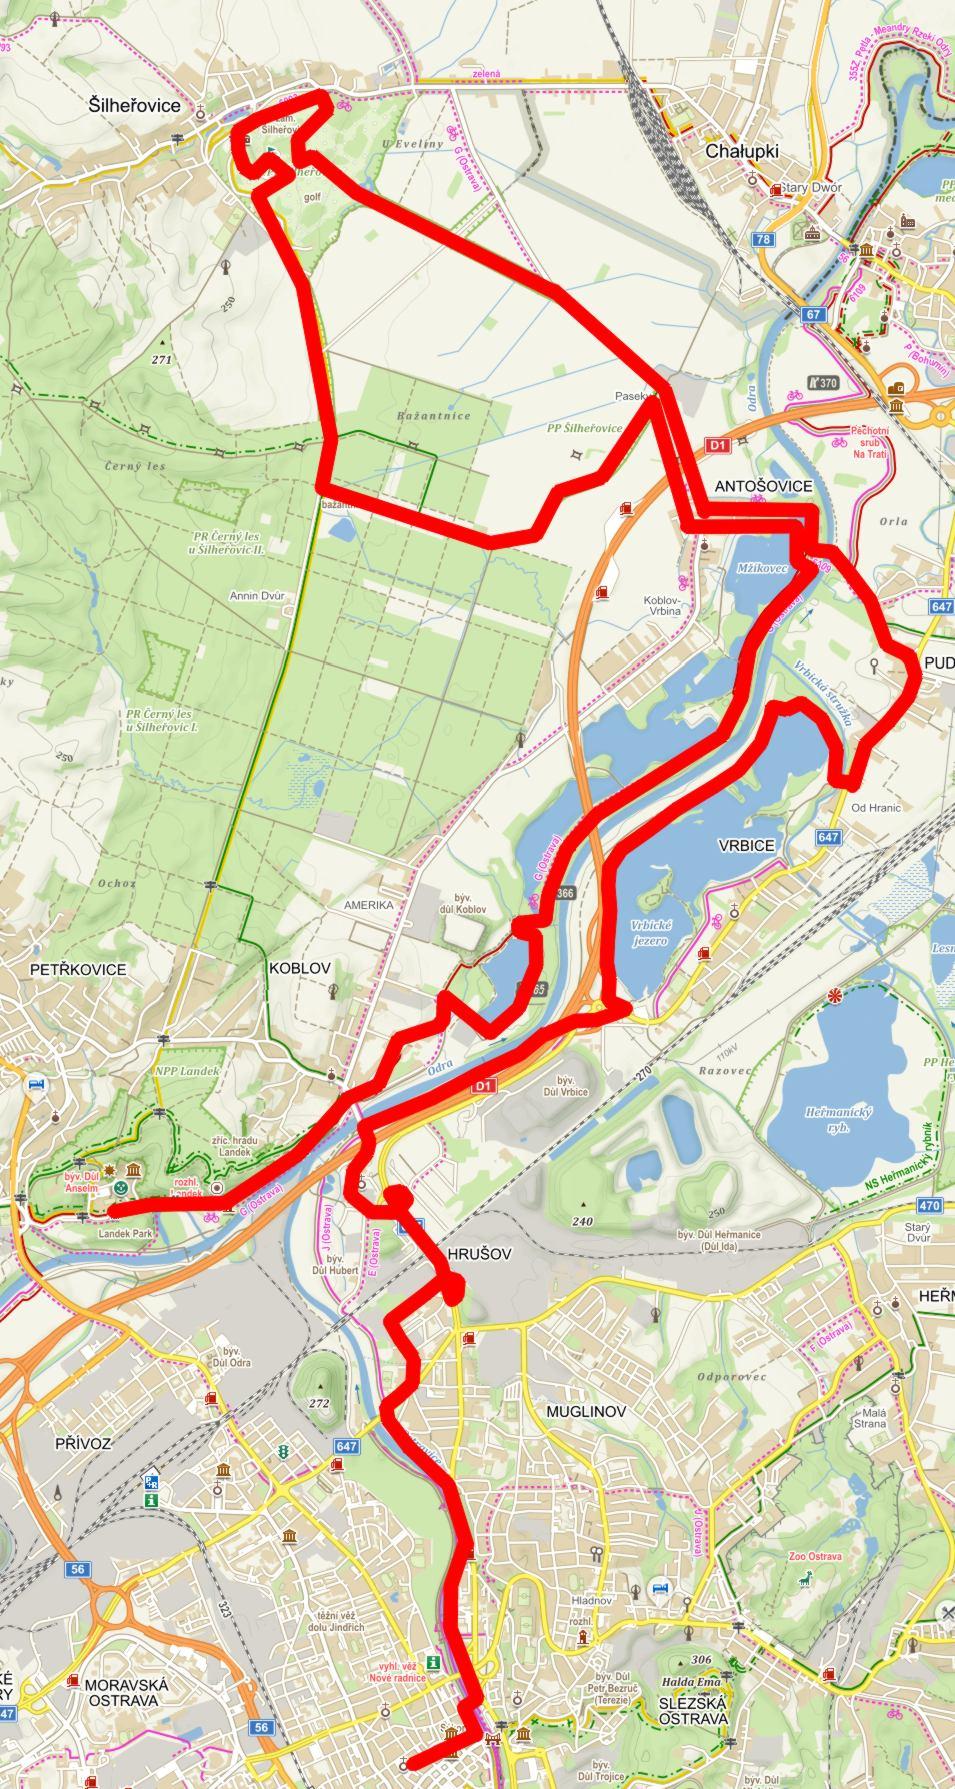 cyklovýlet_2014 Mapa